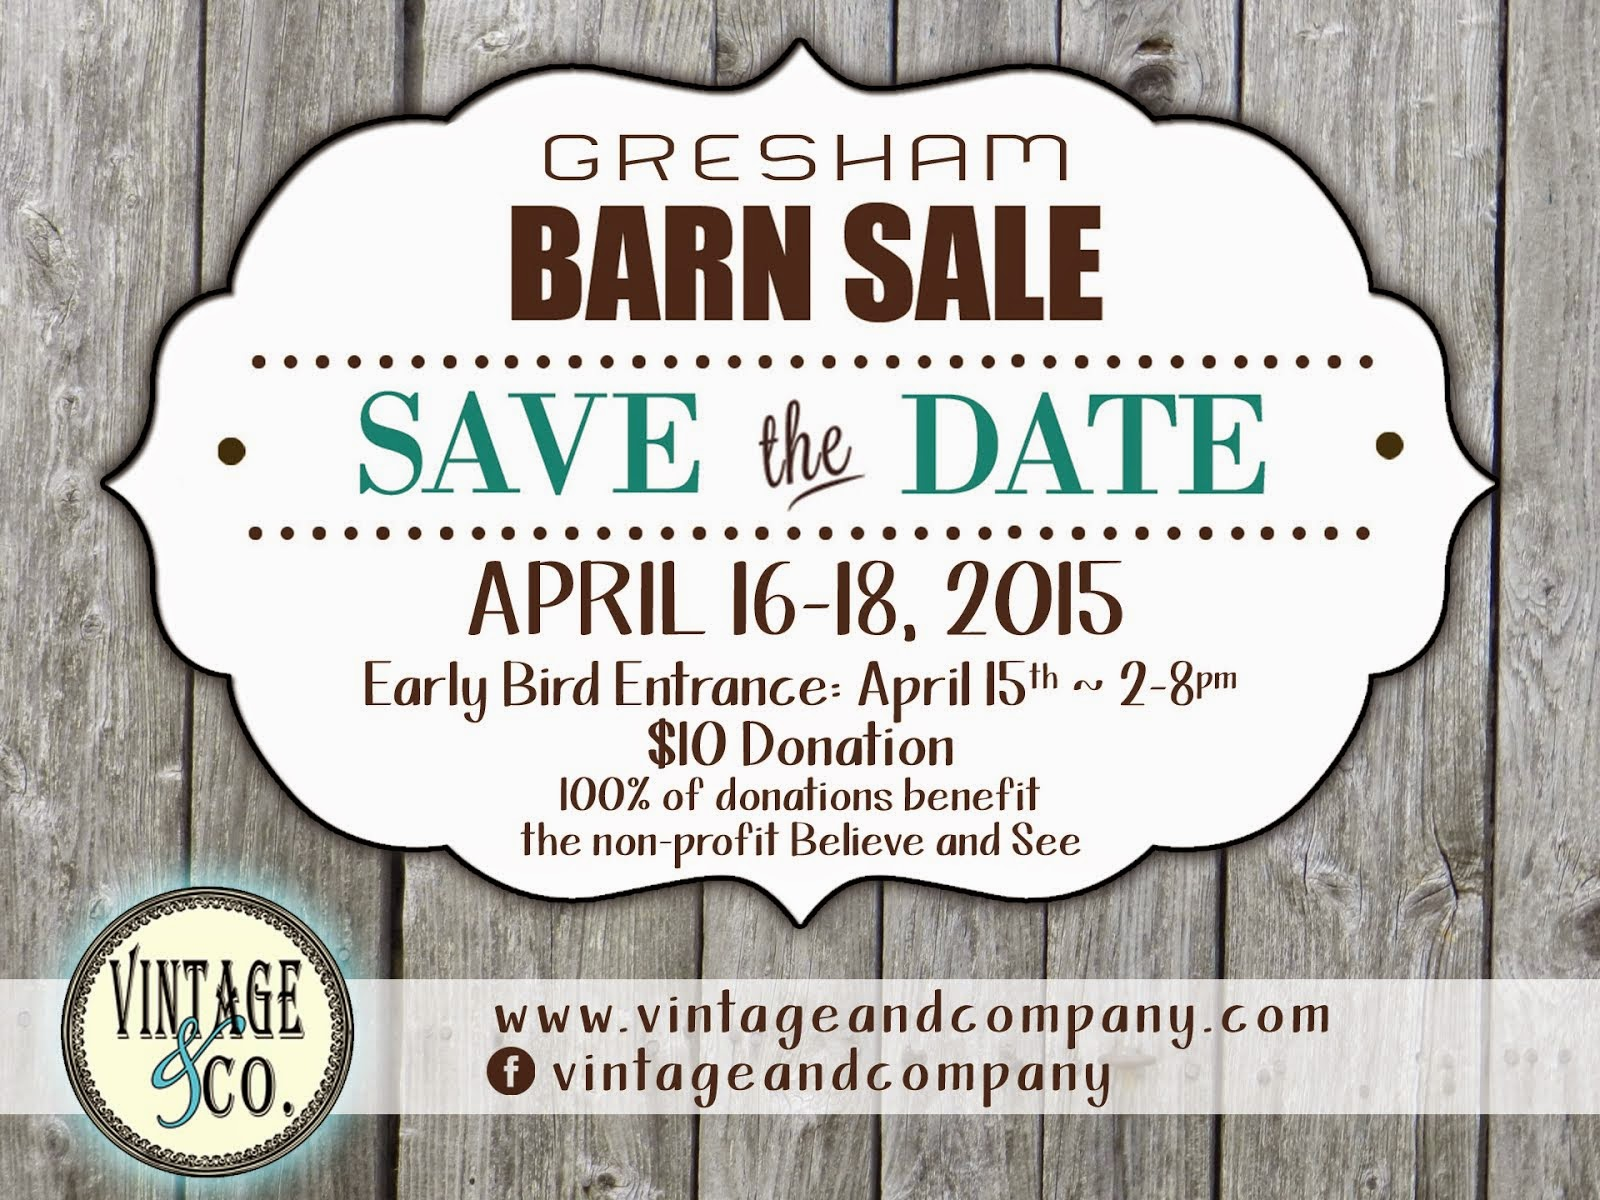 Spring Barn Sale Dates